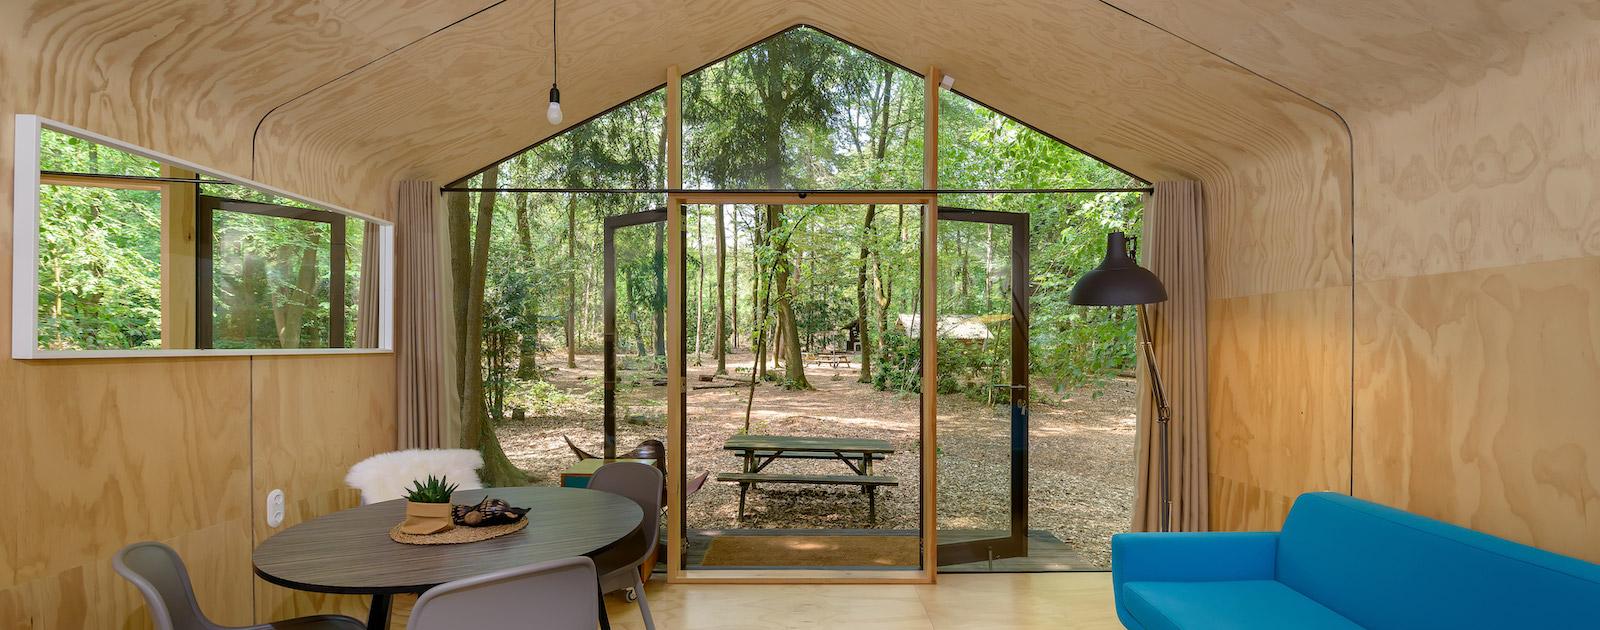 Supertrips - Natuurhuisje in het bos